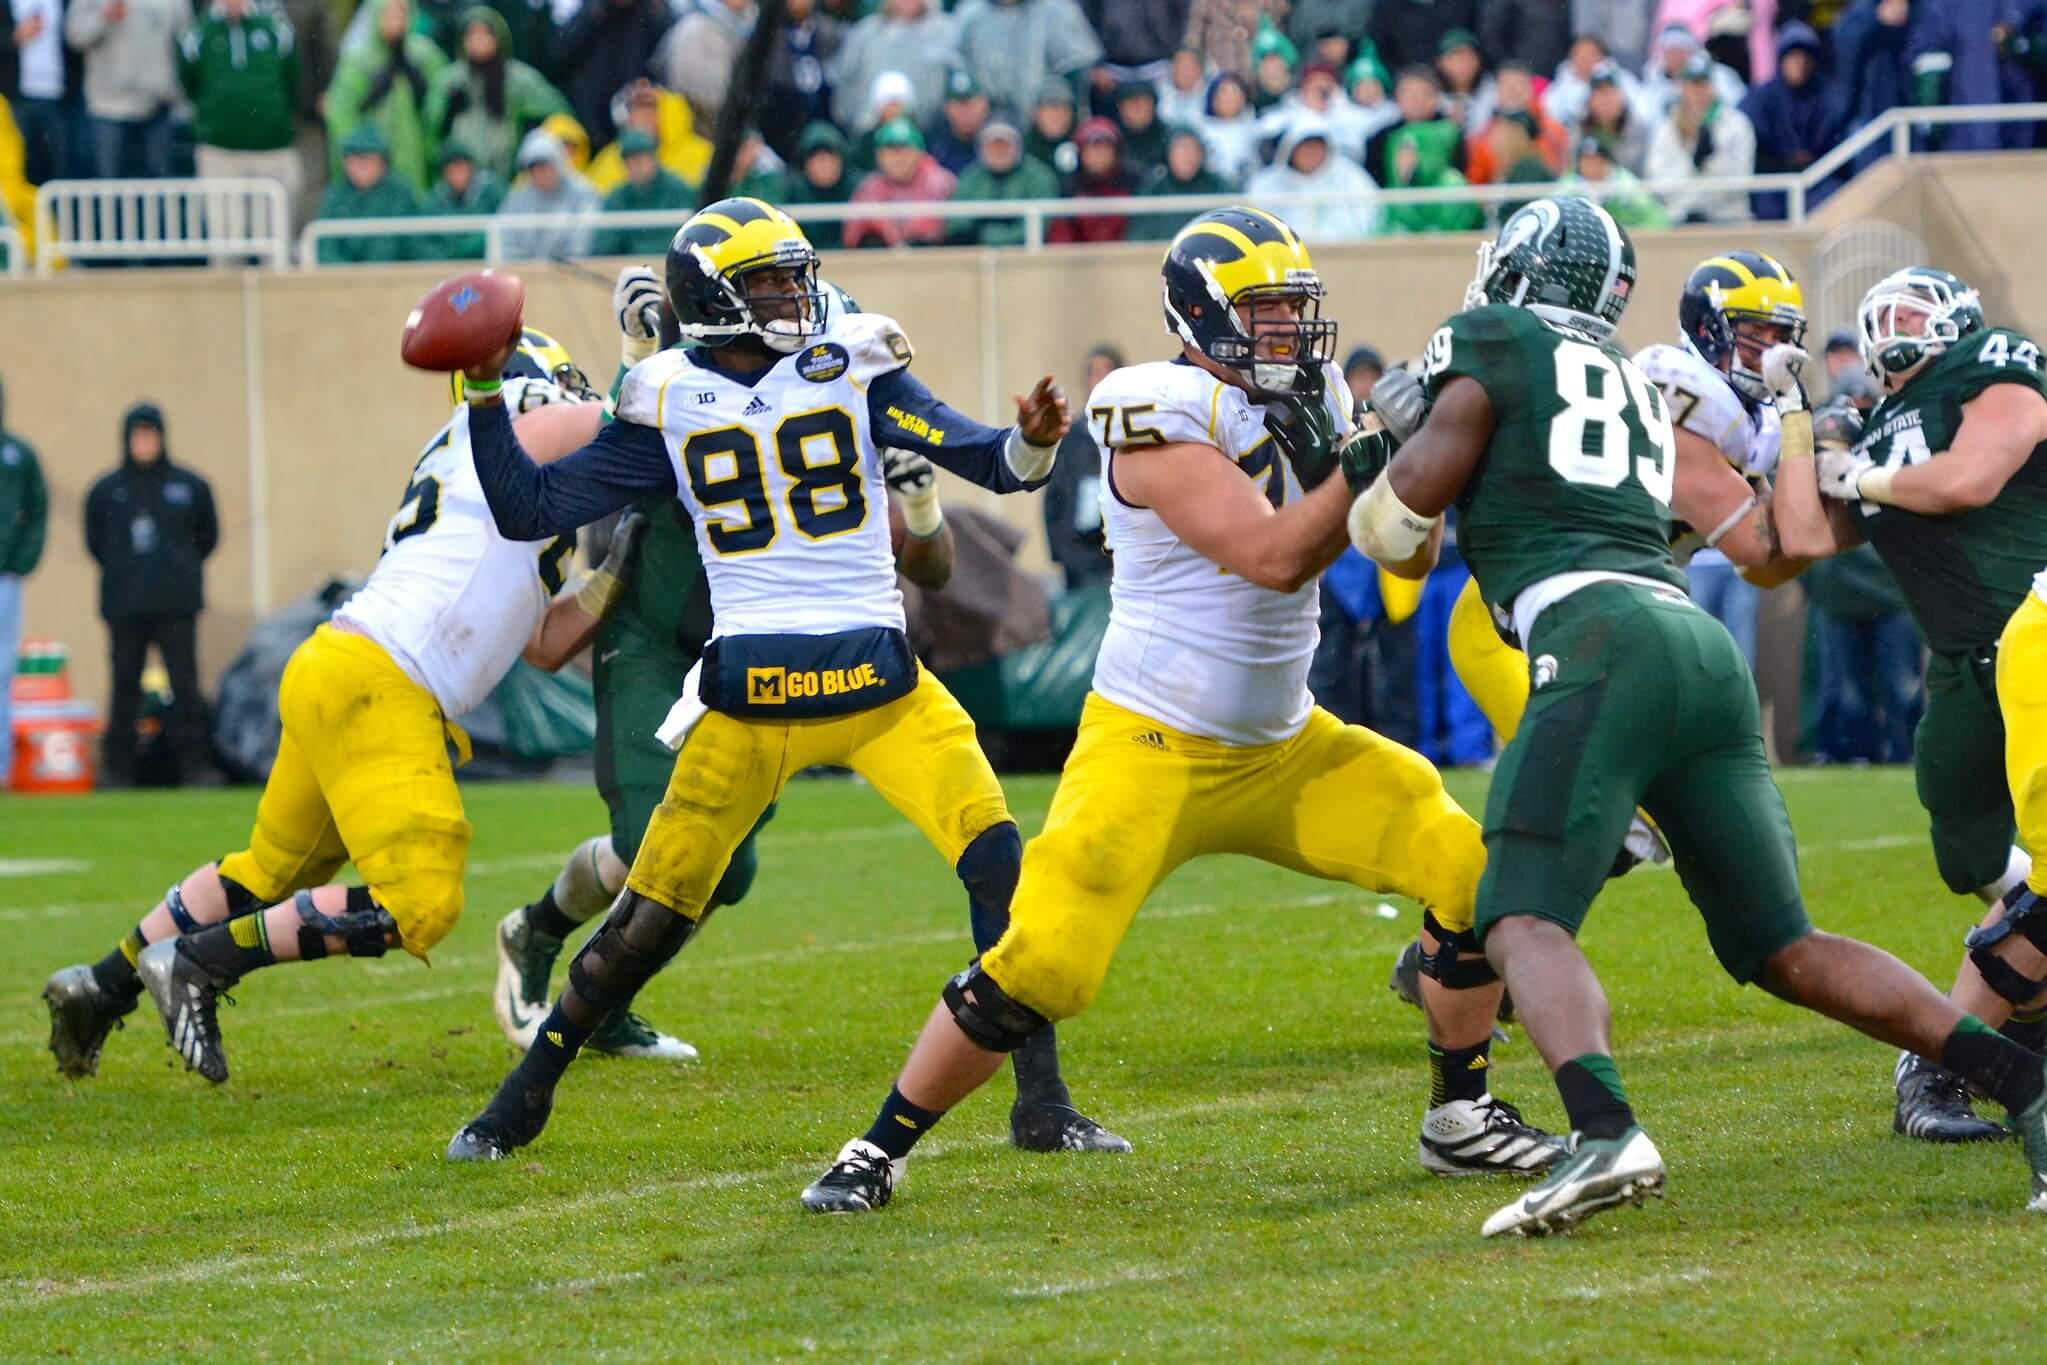 Michigan vs Michigan State football game